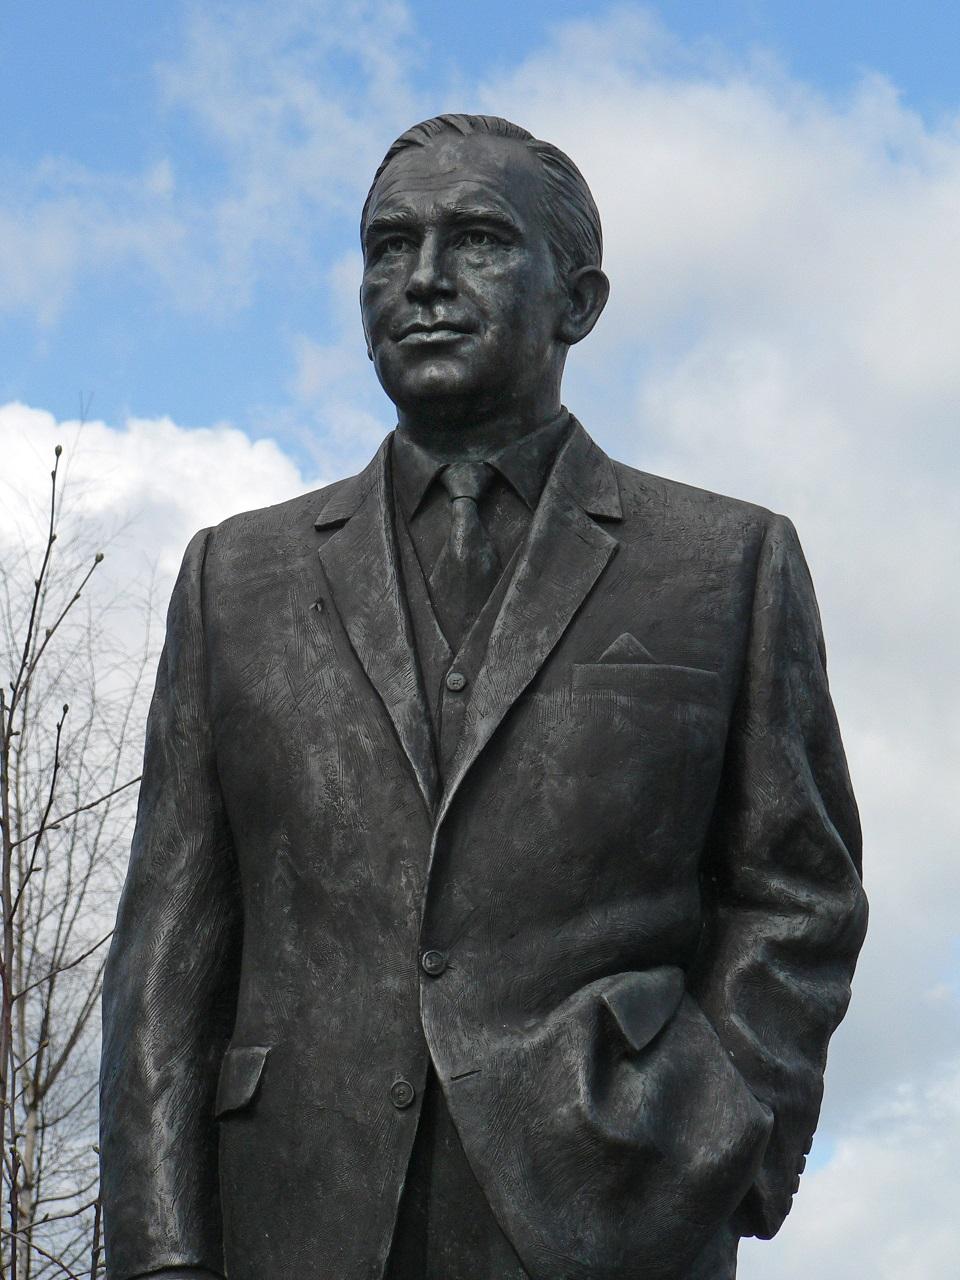 Detalle de la estatua de Ramsey en Ipswich (WIKIPEDIA).